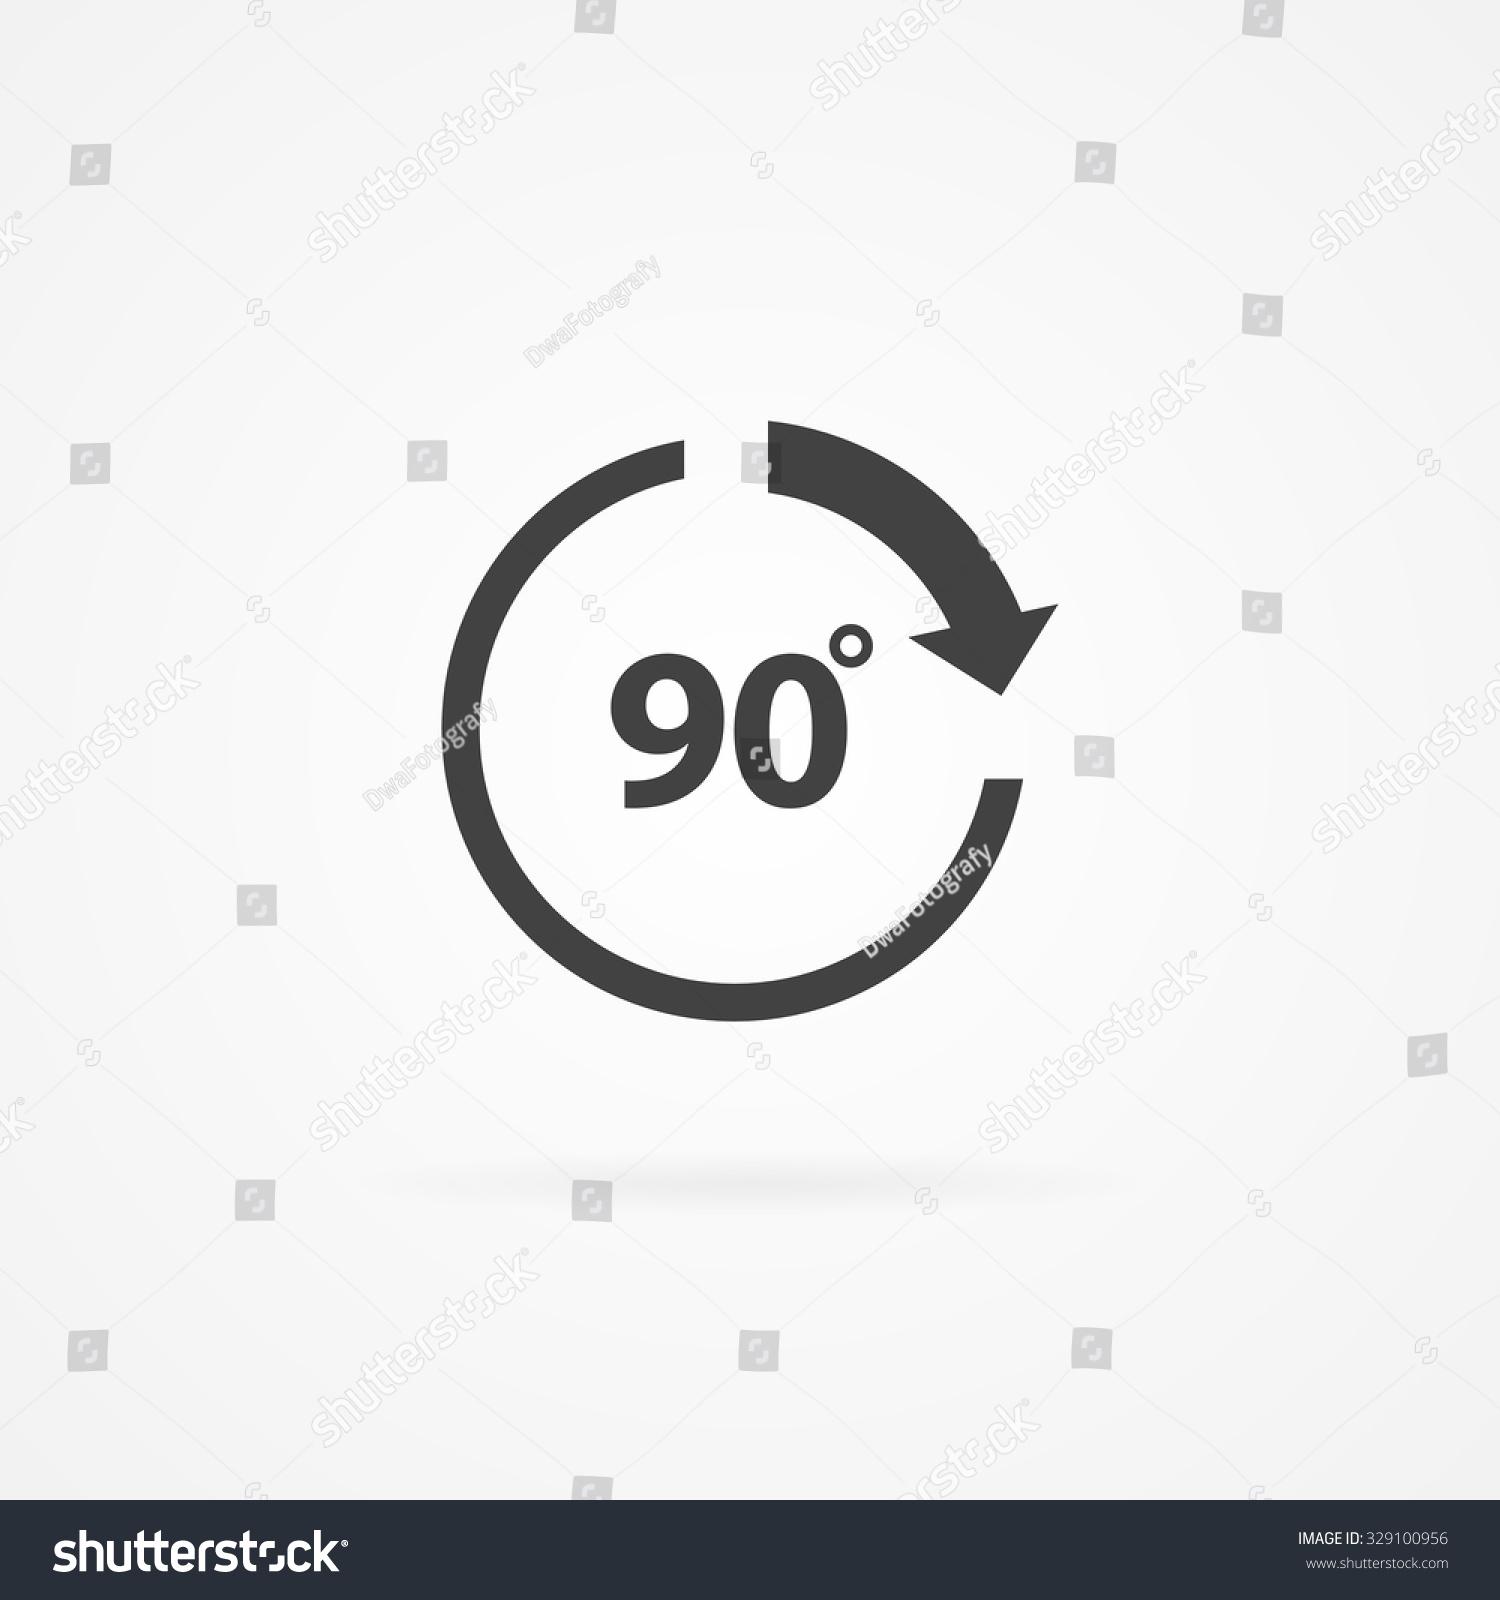 Circle Arrow 90 Degree Text Inside Stock Vector Royalty Free